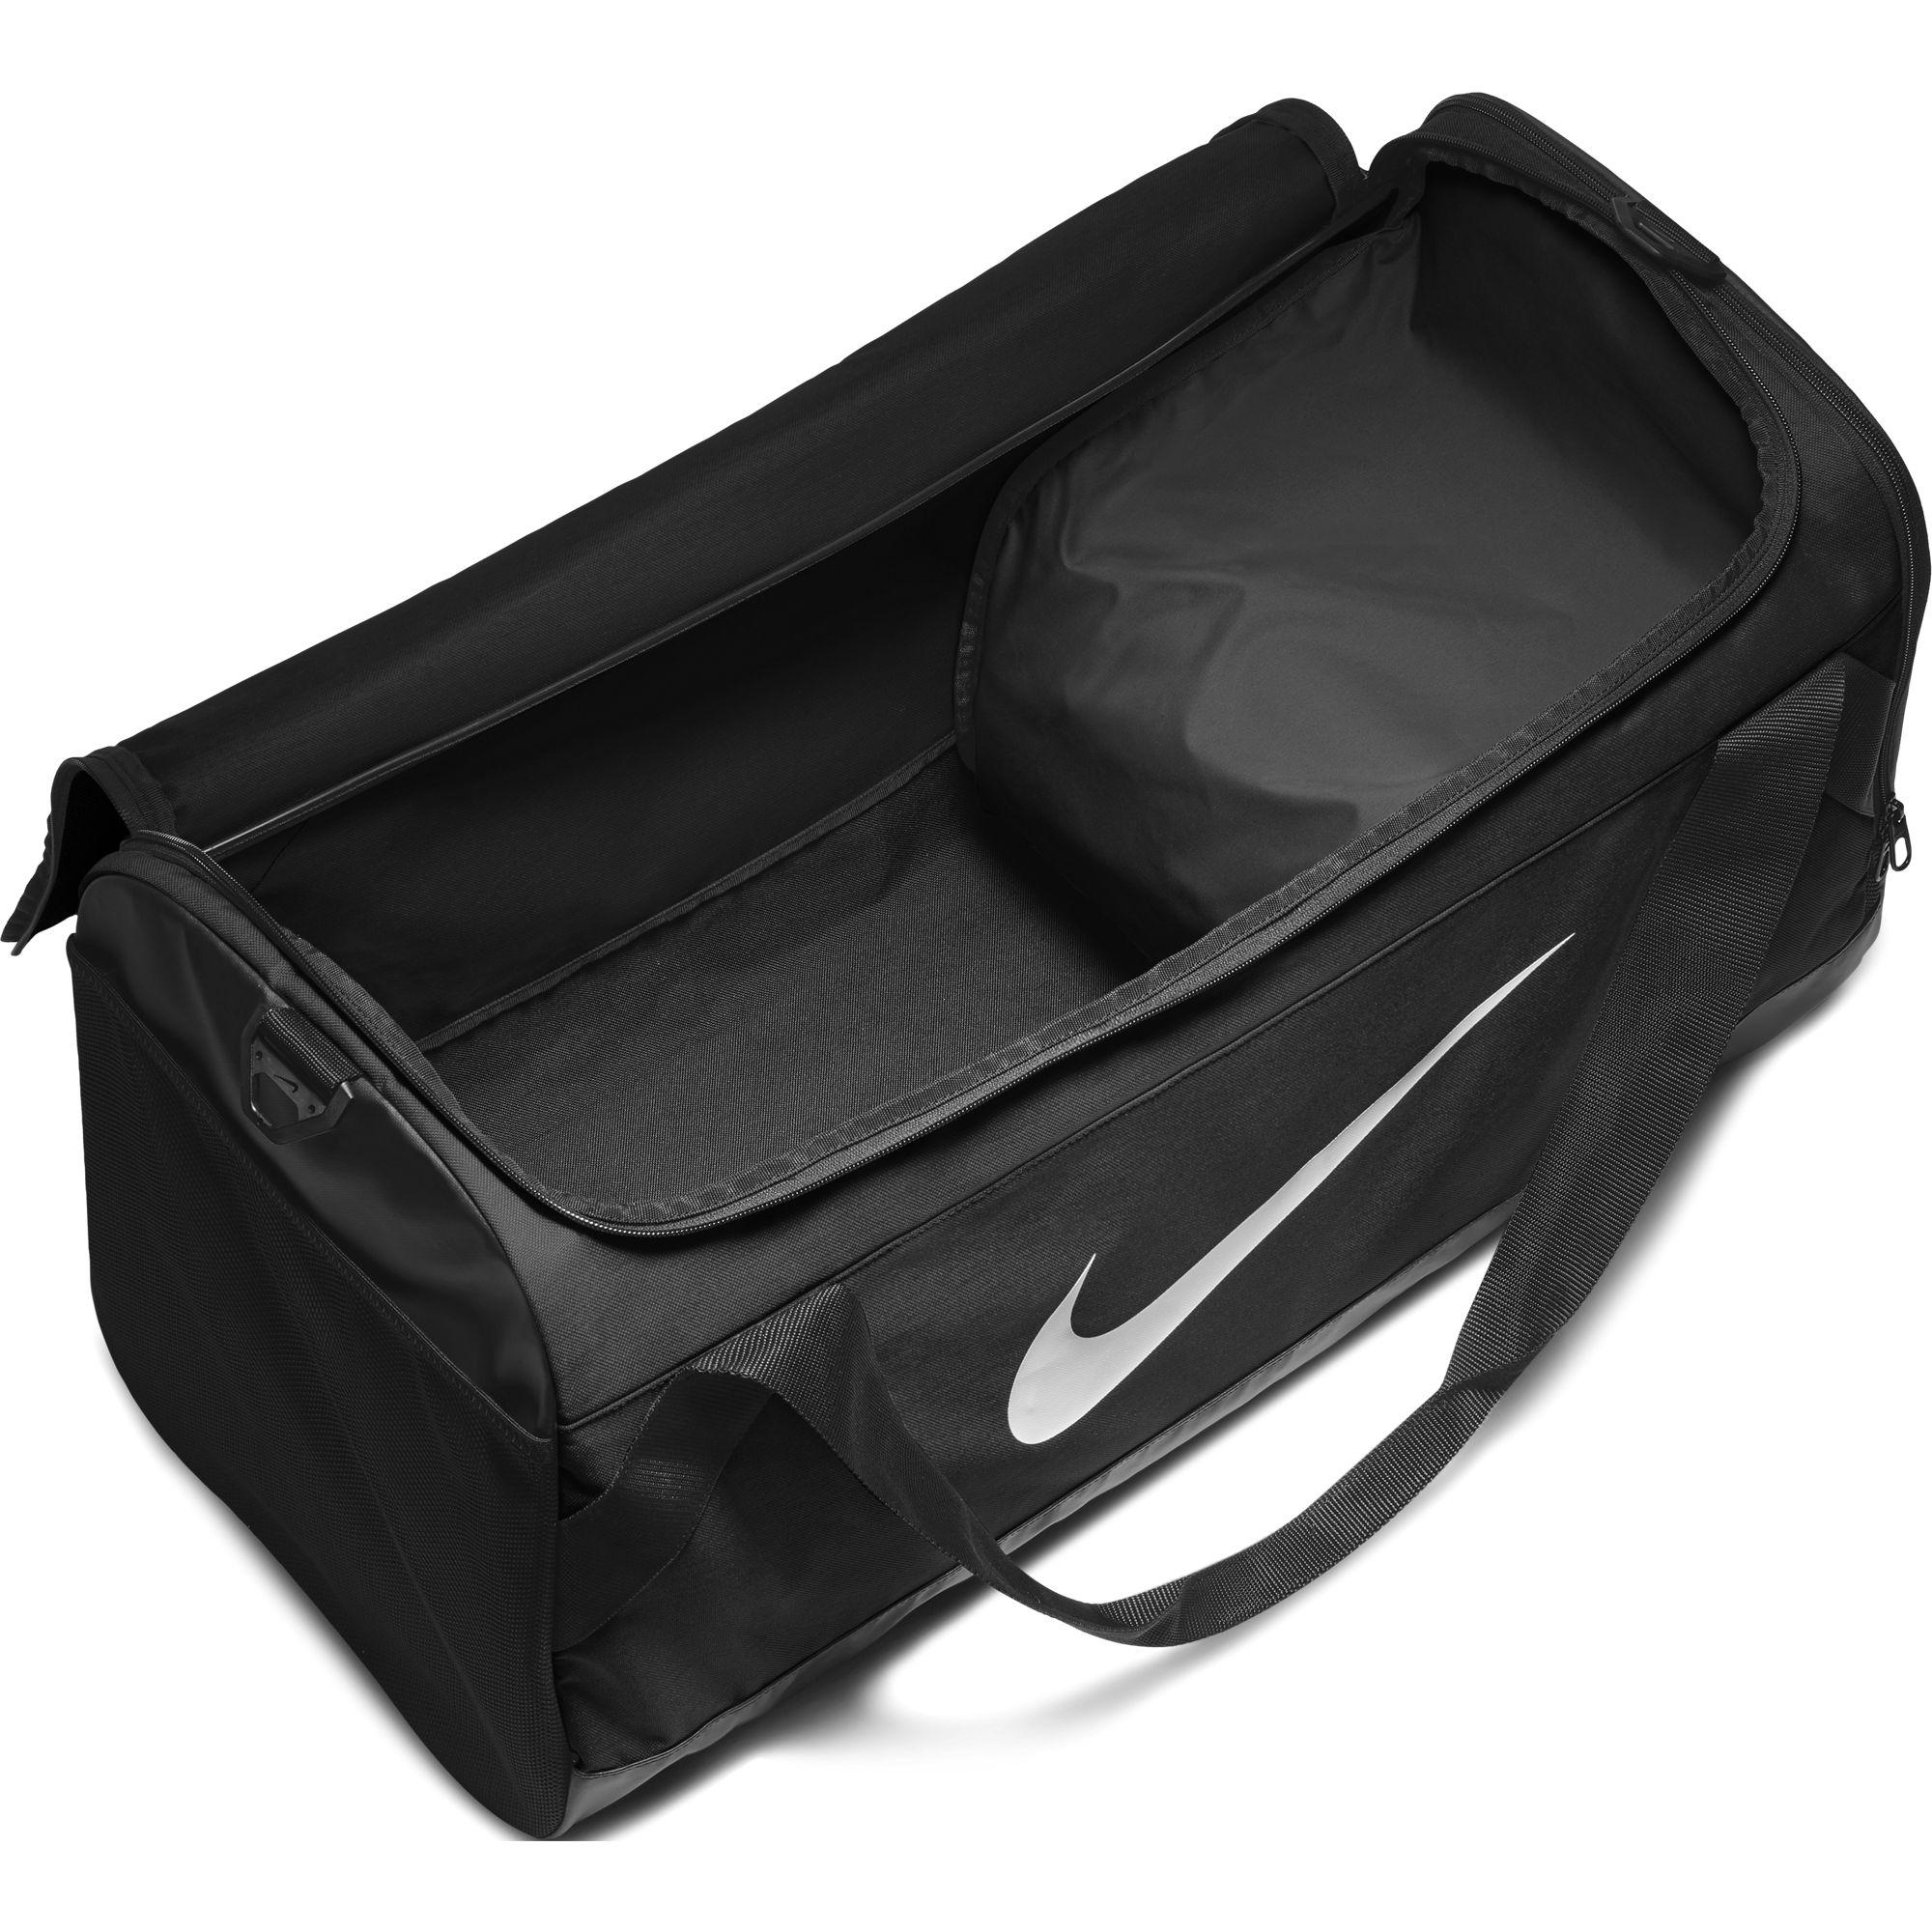 9a7927202e461 ... torba Nike Brasilia (Large) Training Duffel Bag BA5333 010 ...